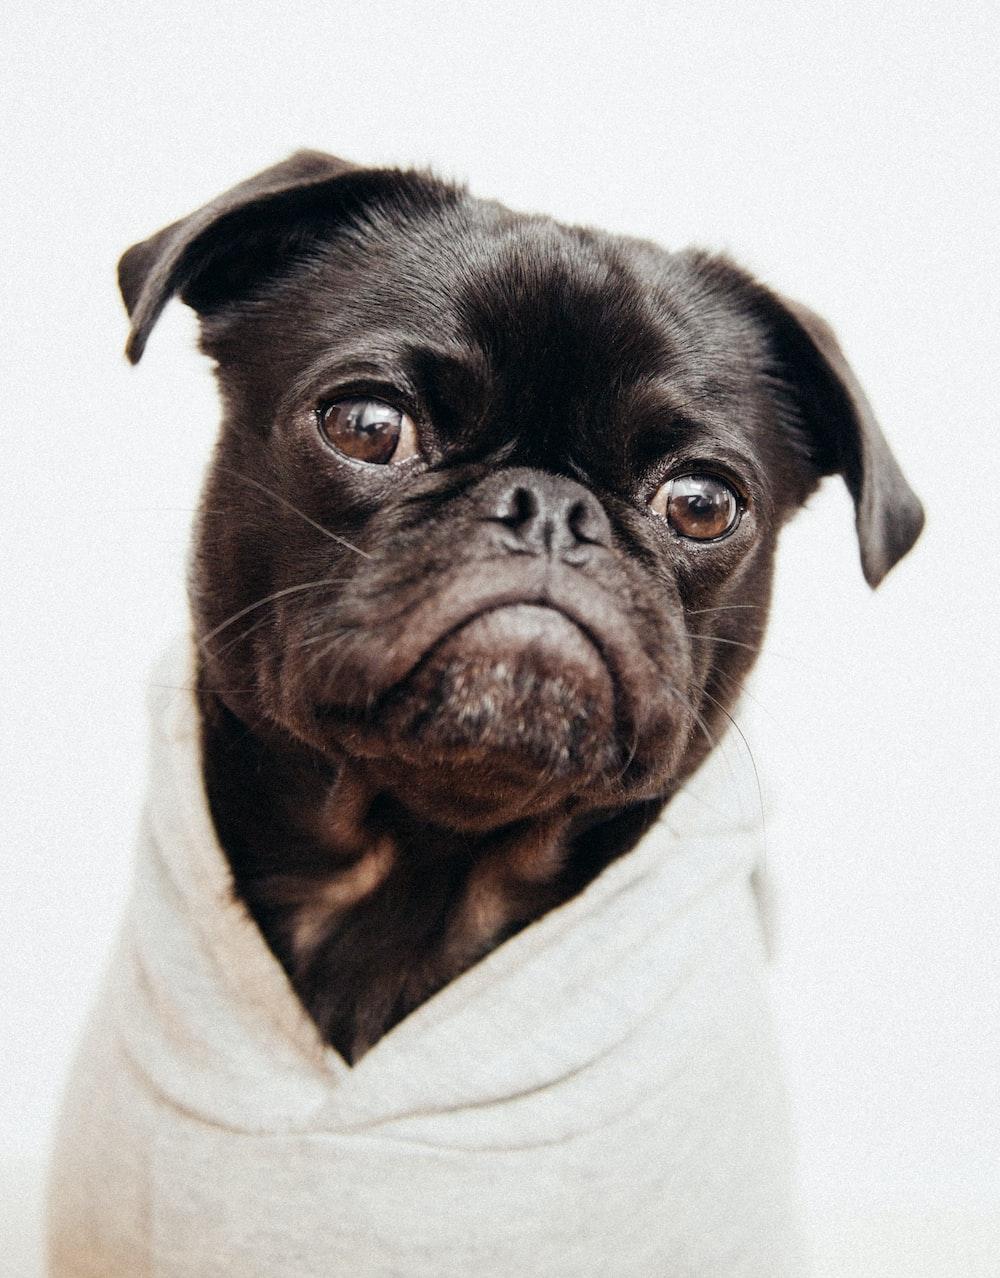 close-up photo of black pug